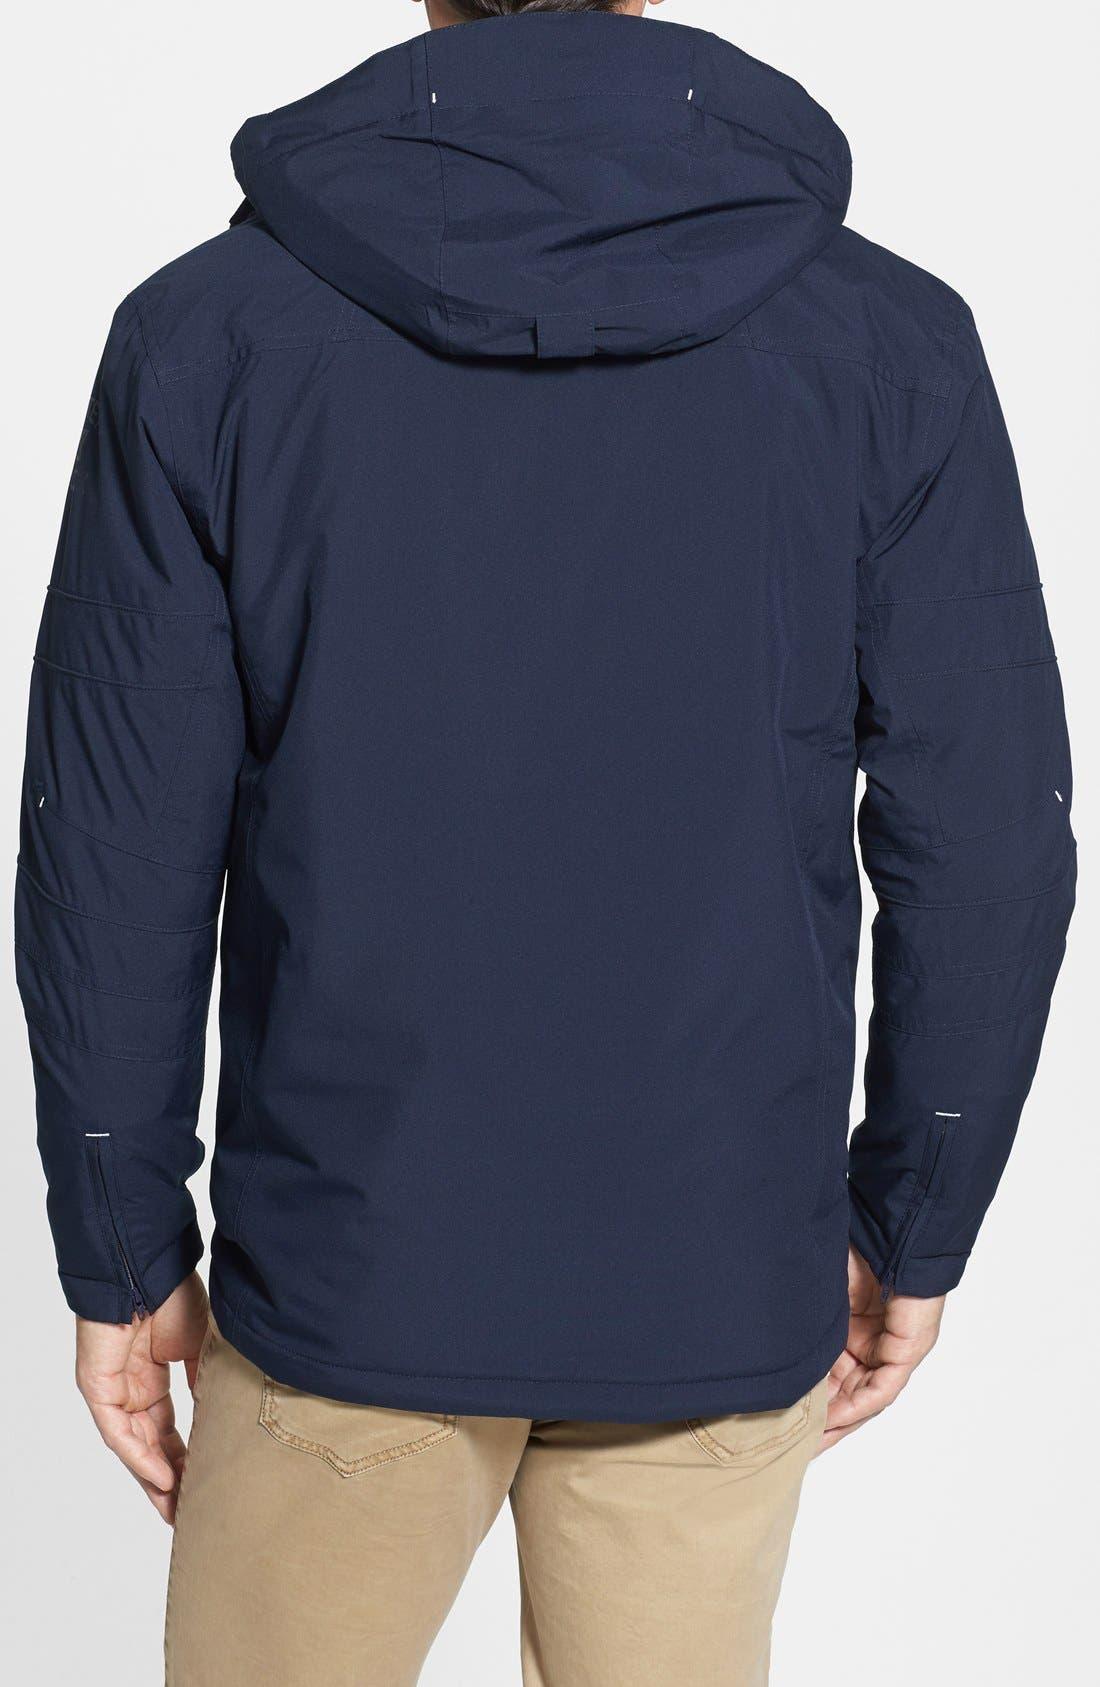 Alternate Image 2  - Cutter & Buck WeatherTec Sanders Jacket (Big & Tall)